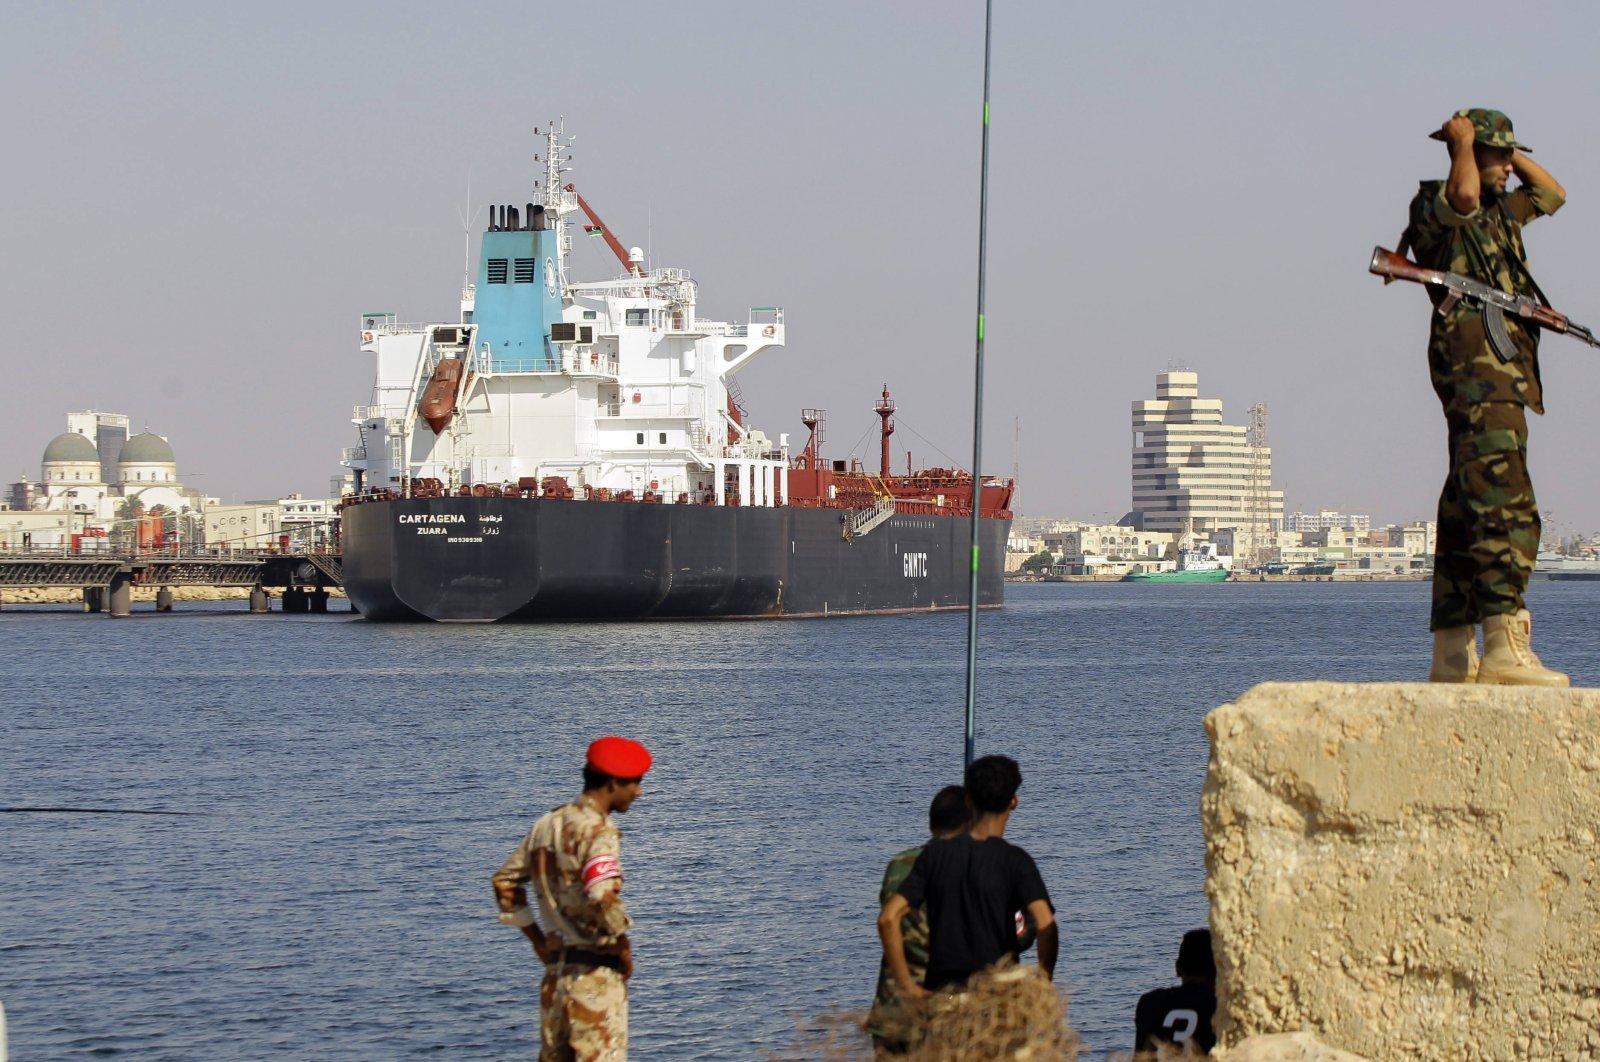 The tanker Cartagena docked in the sea port of Benghazi, Libya, Thursday, Aug. 4, 2011 (AP File Photo)